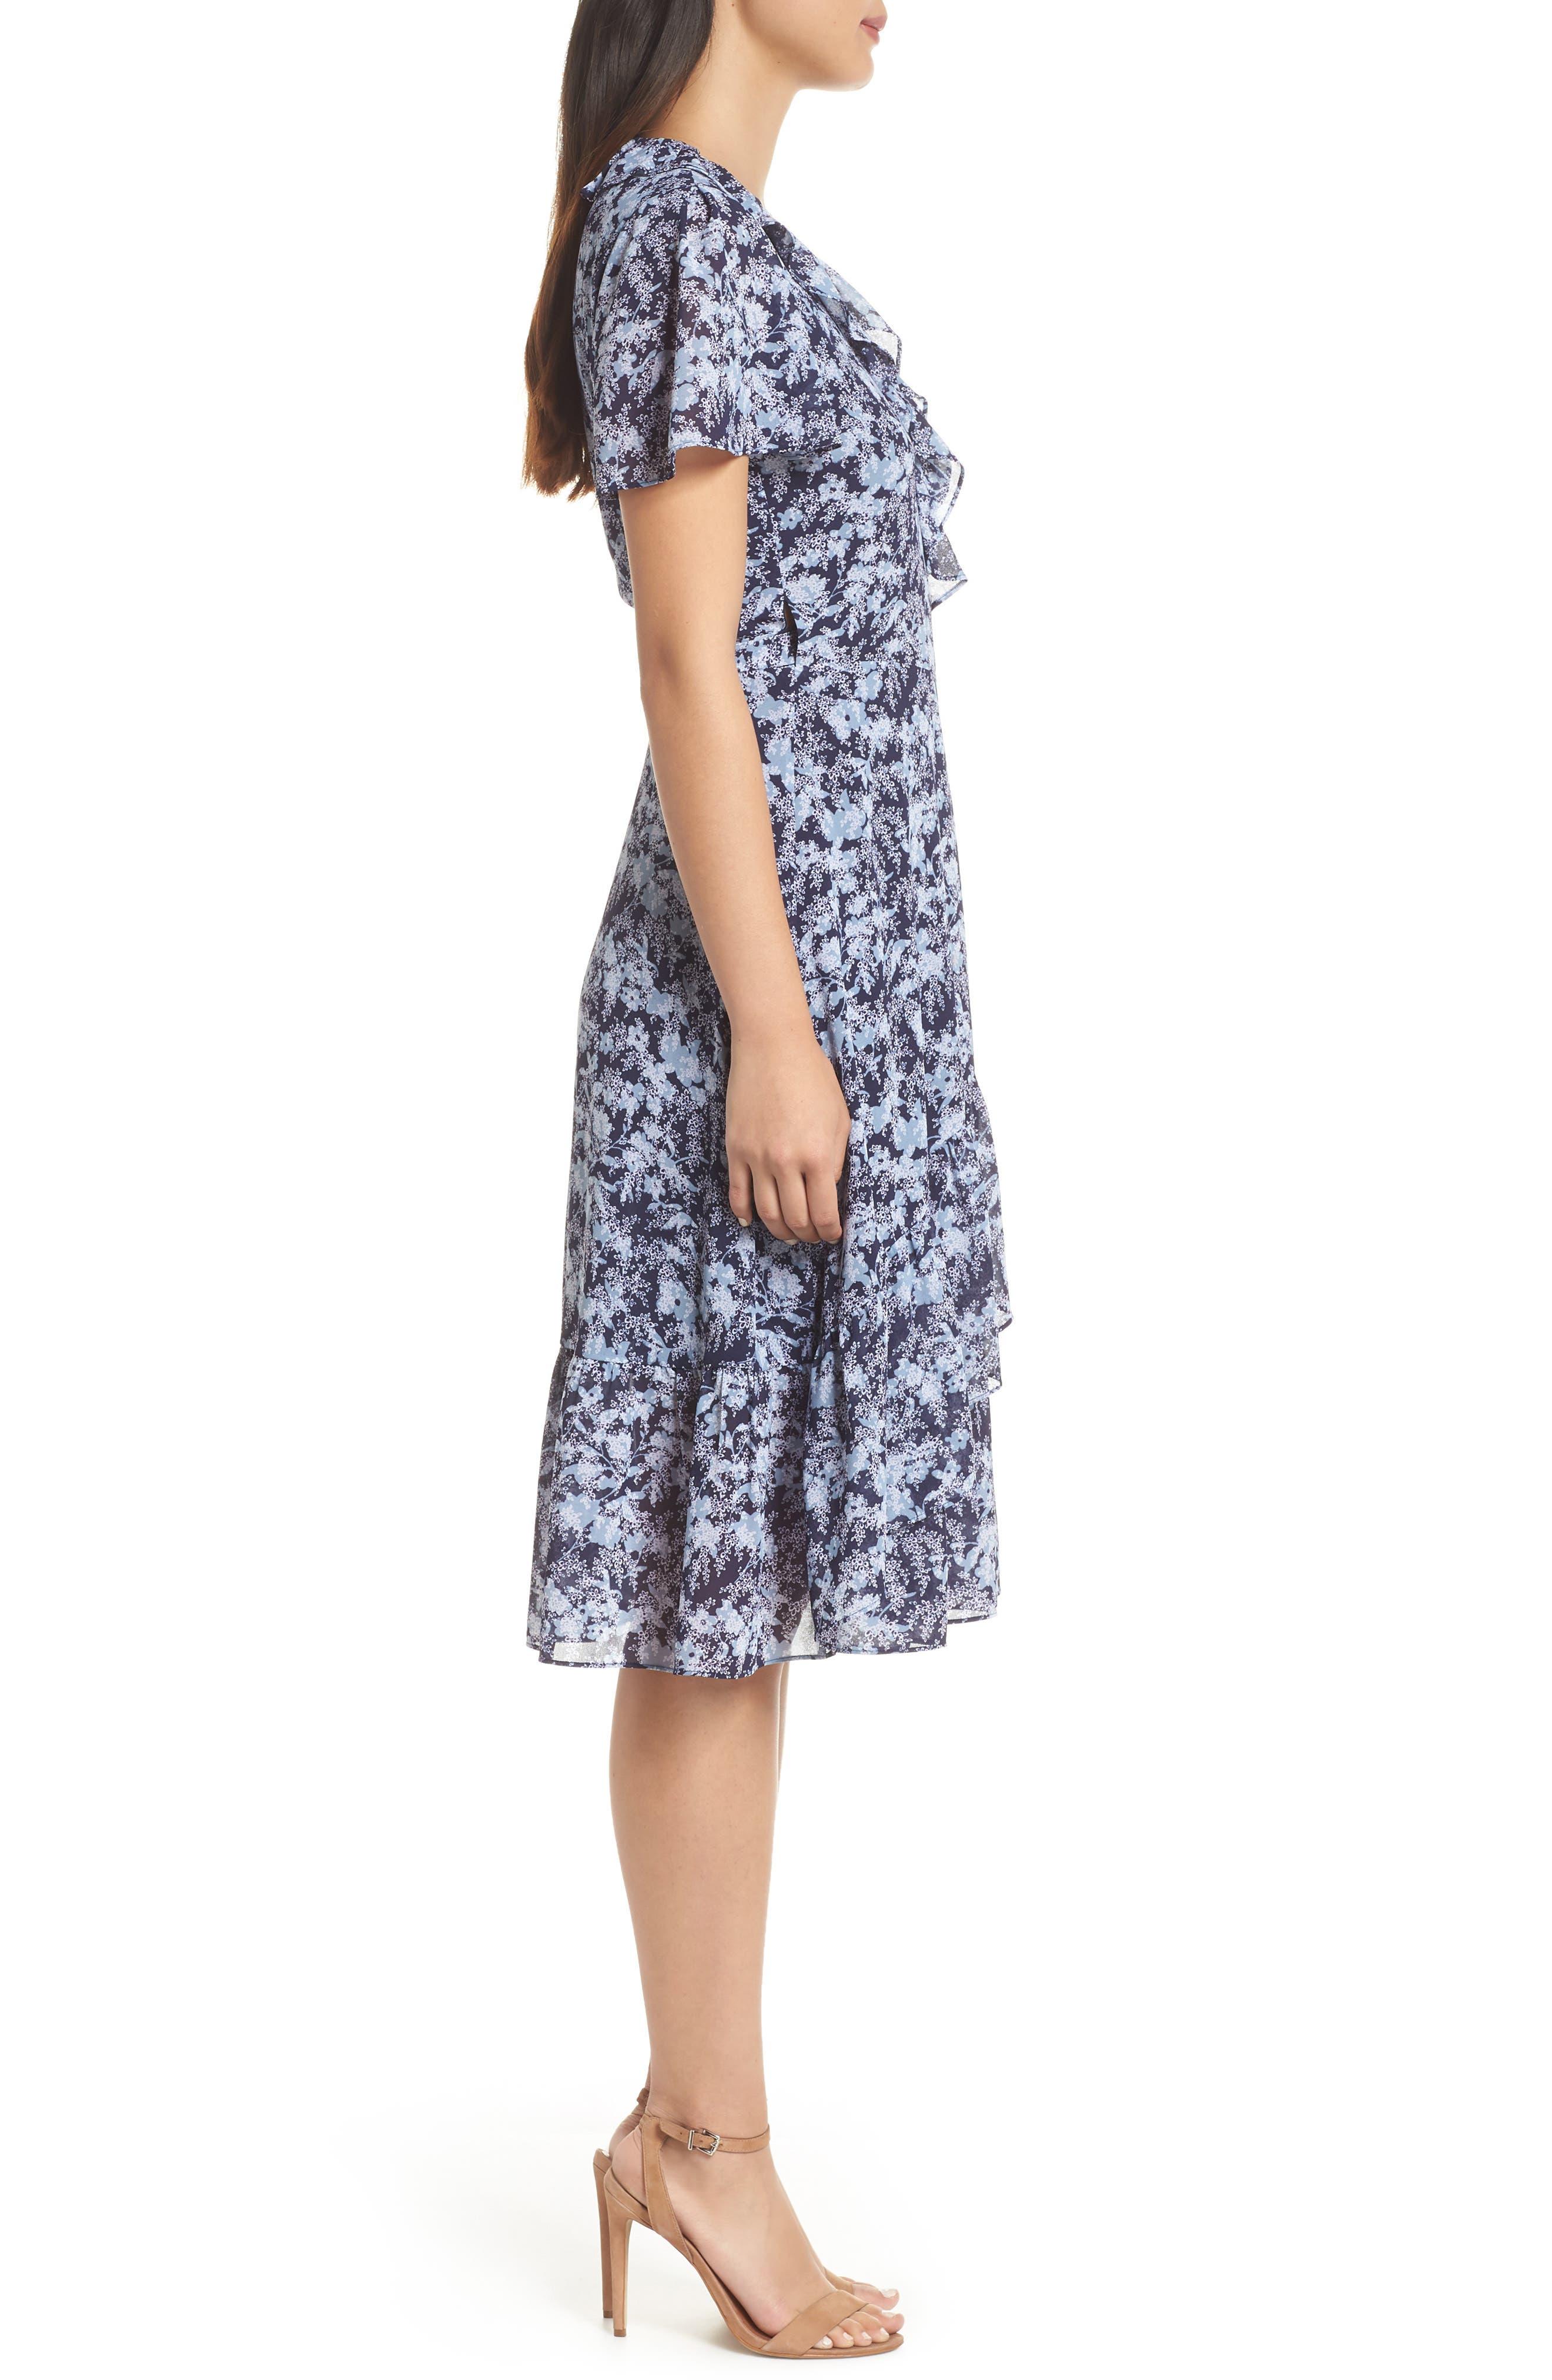 MICHAEL MICHAEL KORS, Ruffle Wrap Dress, Alternate thumbnail 4, color, TRUE NAVY/CHAMBRAY